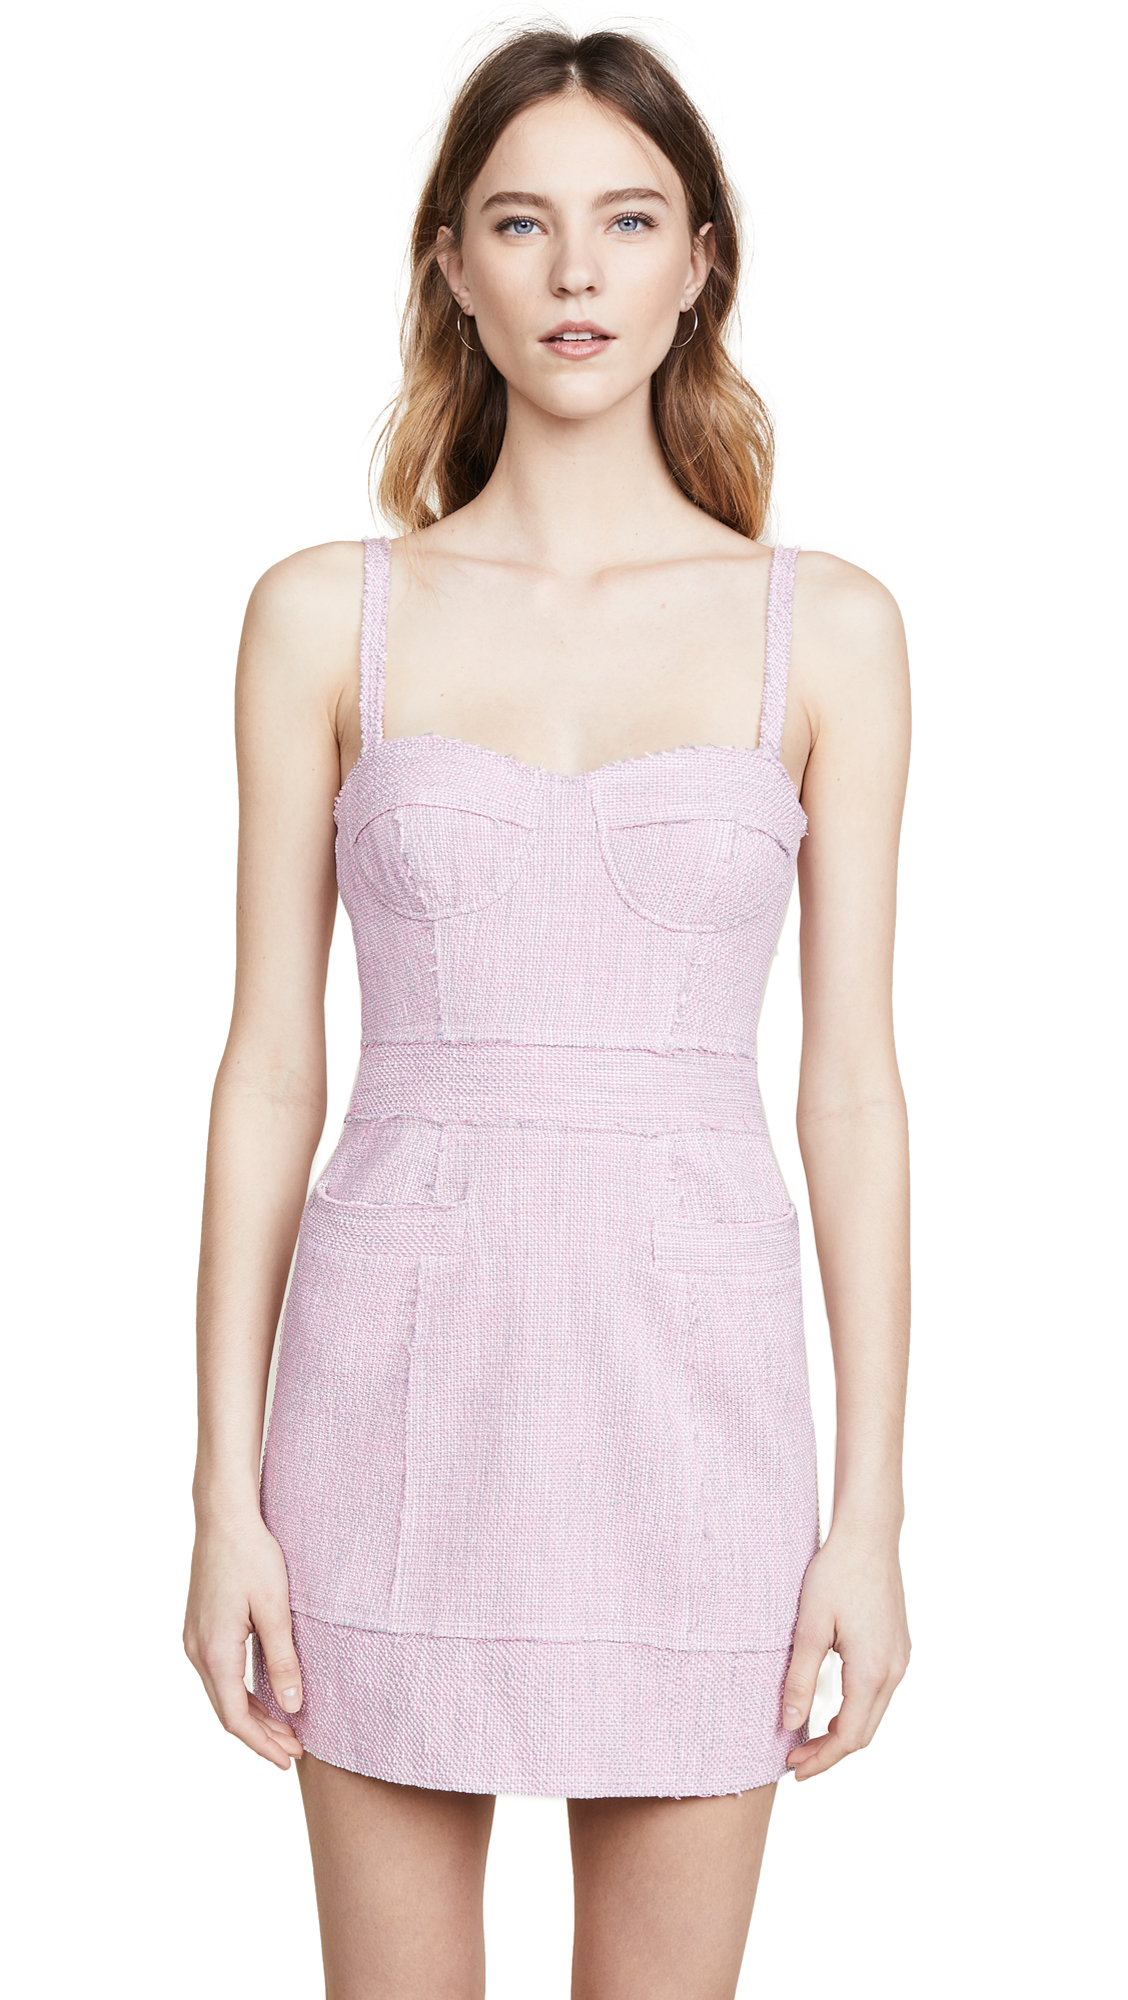 Milly Tweed Bustier Dress